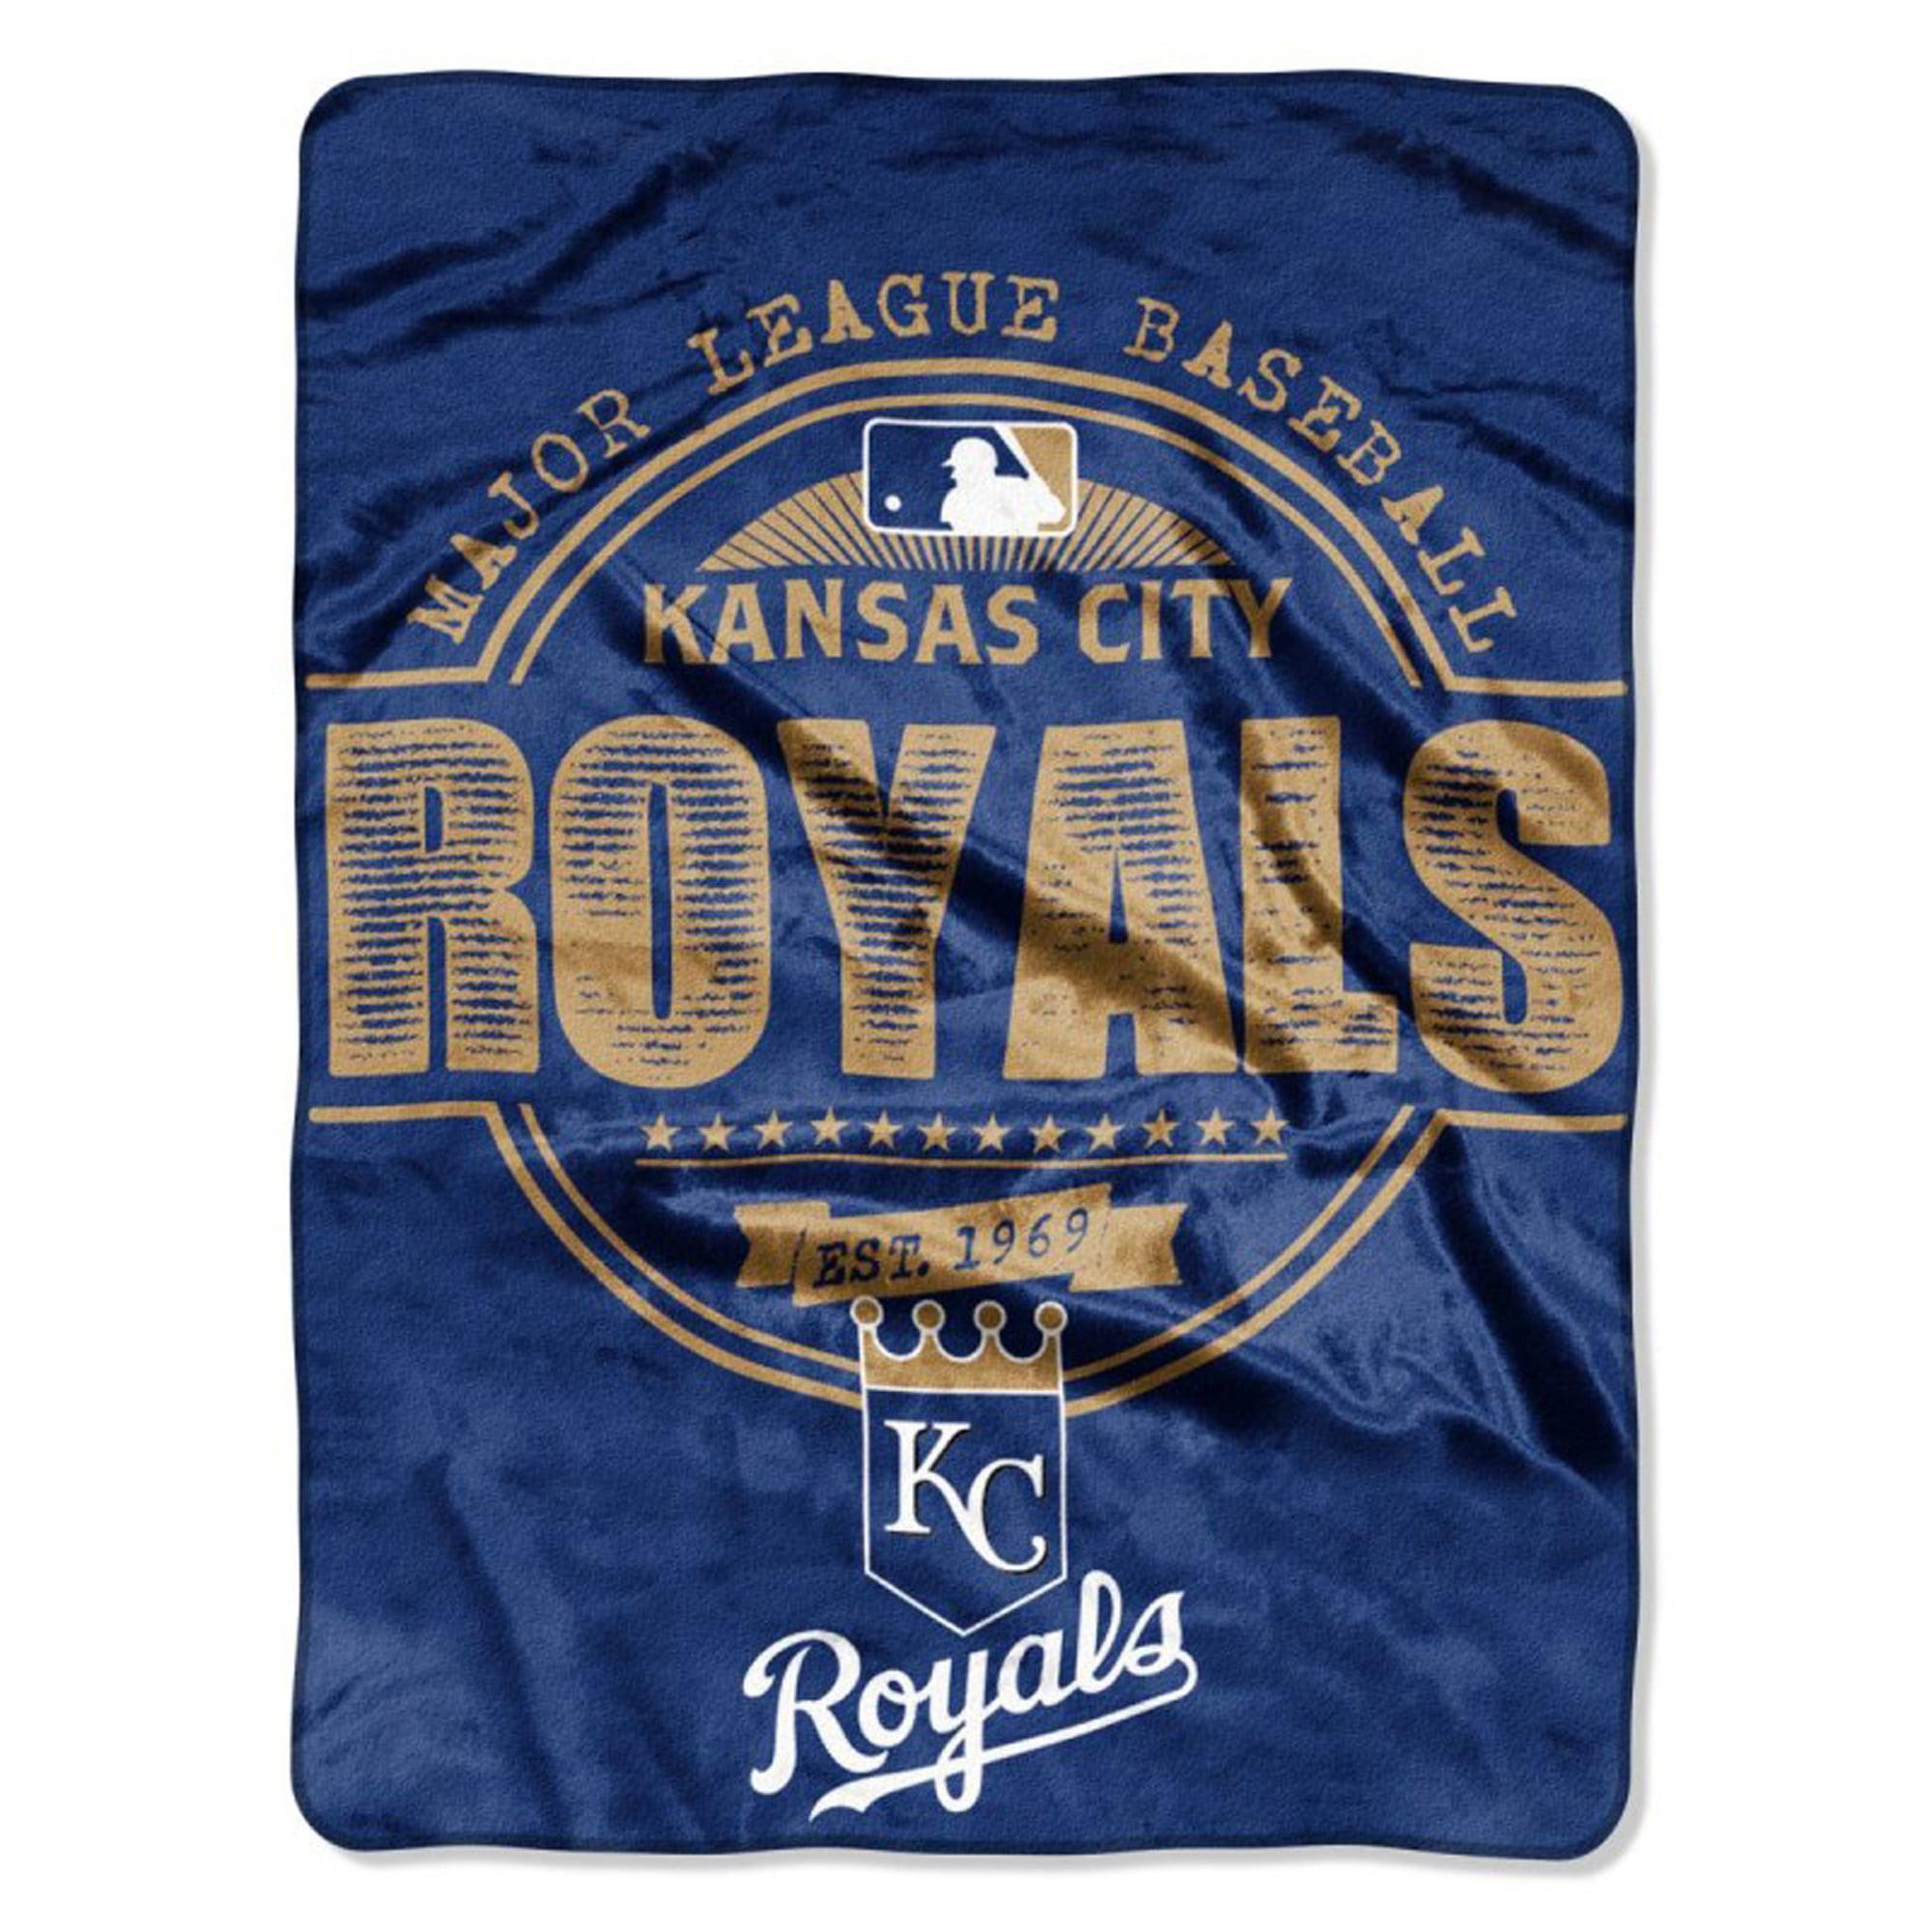 "Kansas City Royals The Northwest Company 46"" x 60"" Structure Micro Raschel Plush Blanket - No Size"